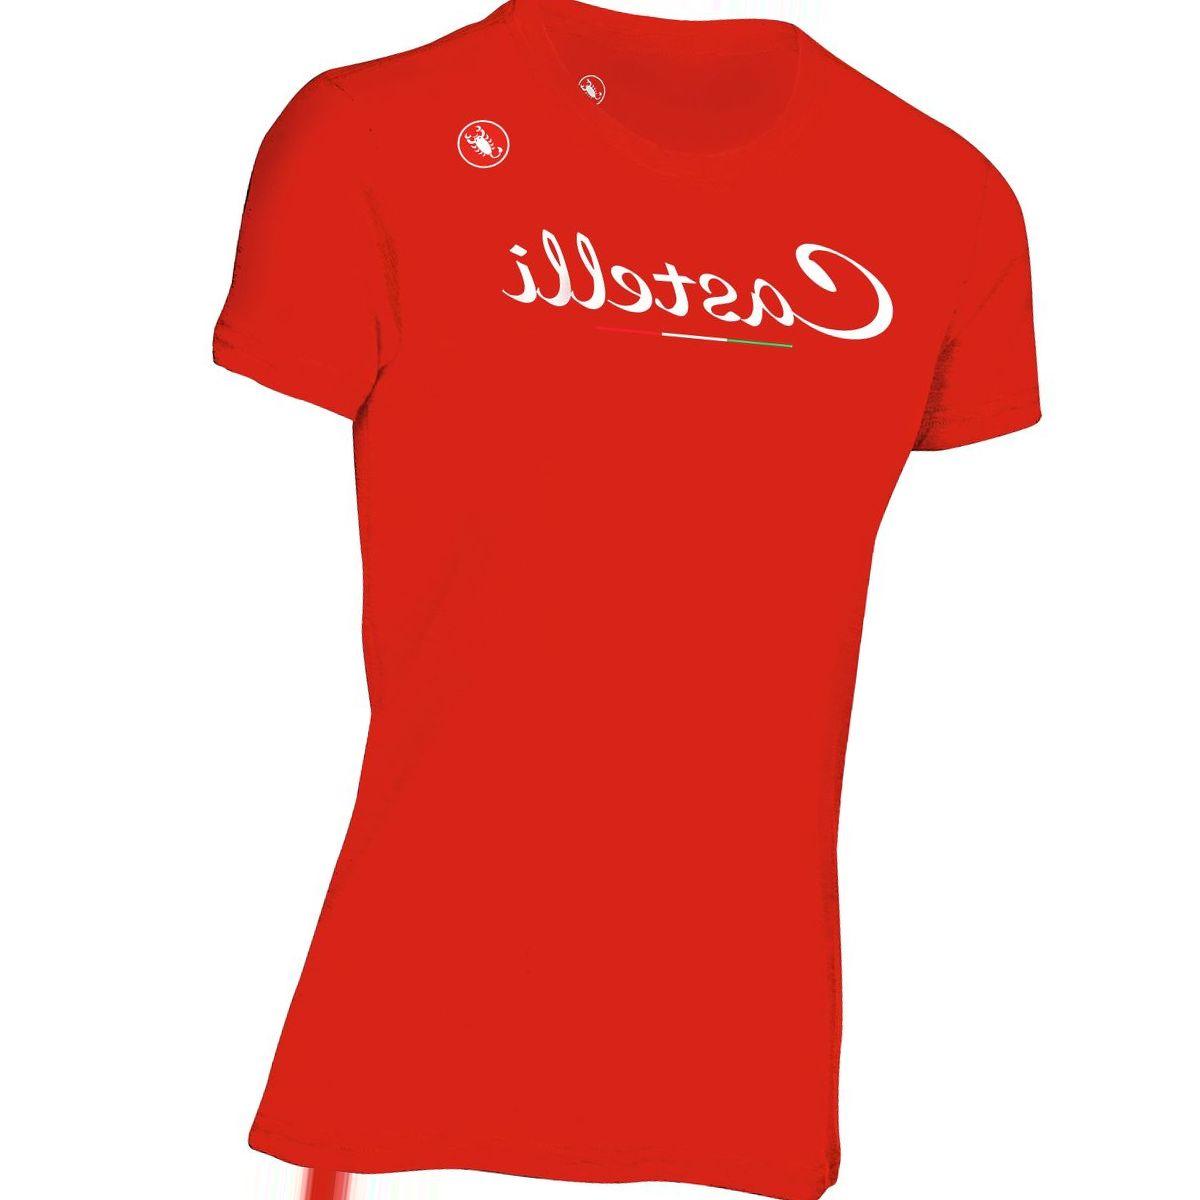 Castelli Classic T-Shirt - Women's